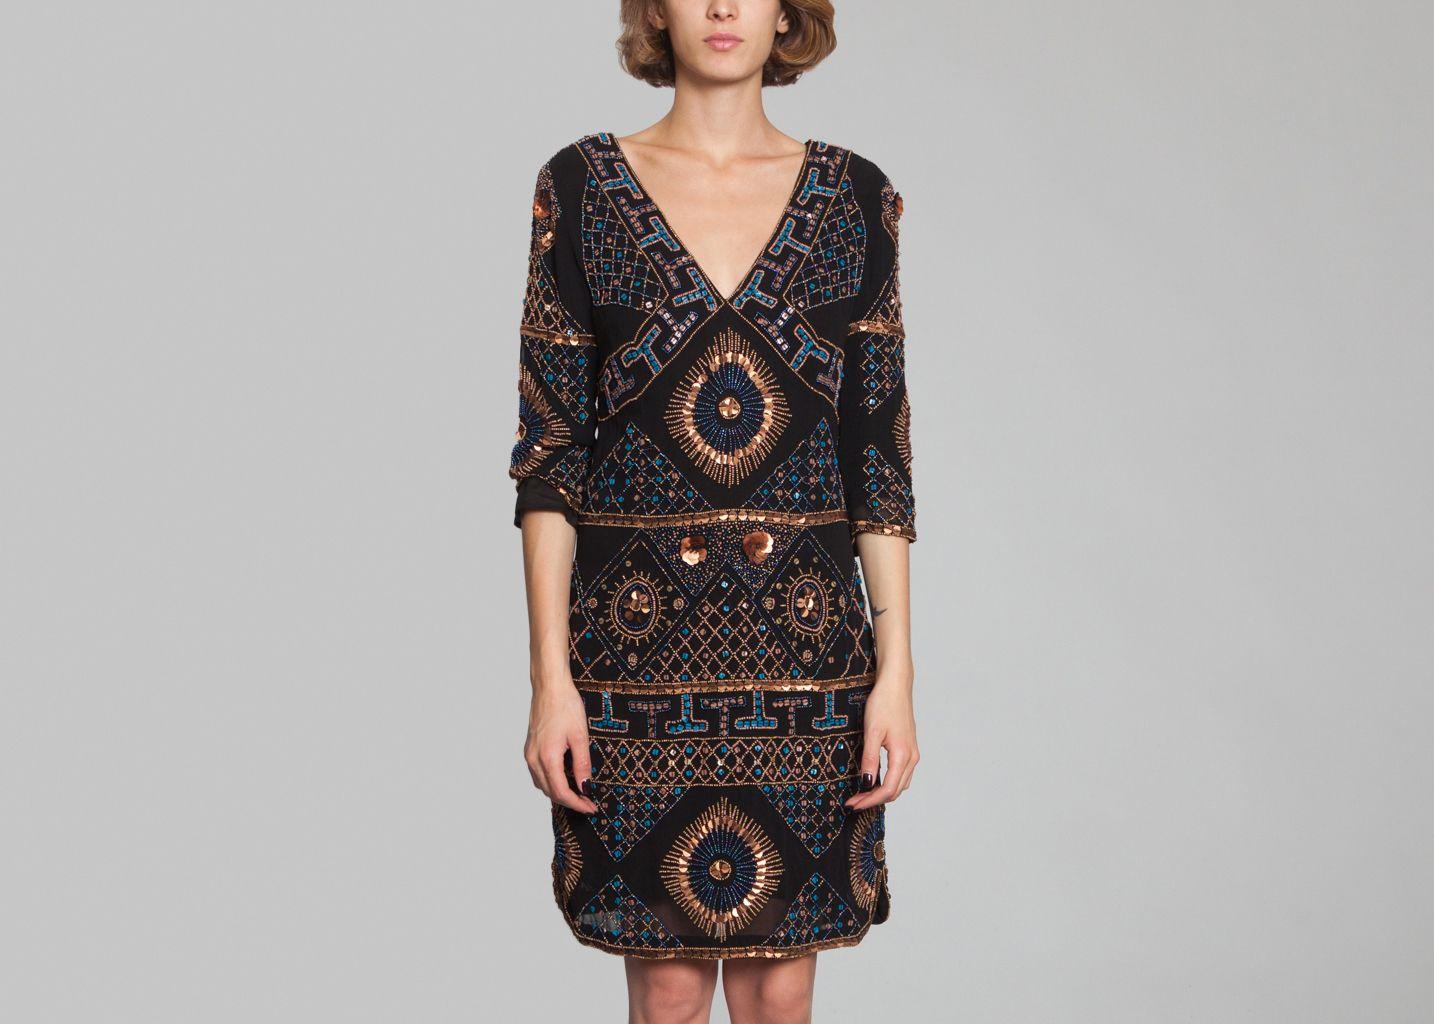 robe imala antik batik noir l 39 exception. Black Bedroom Furniture Sets. Home Design Ideas